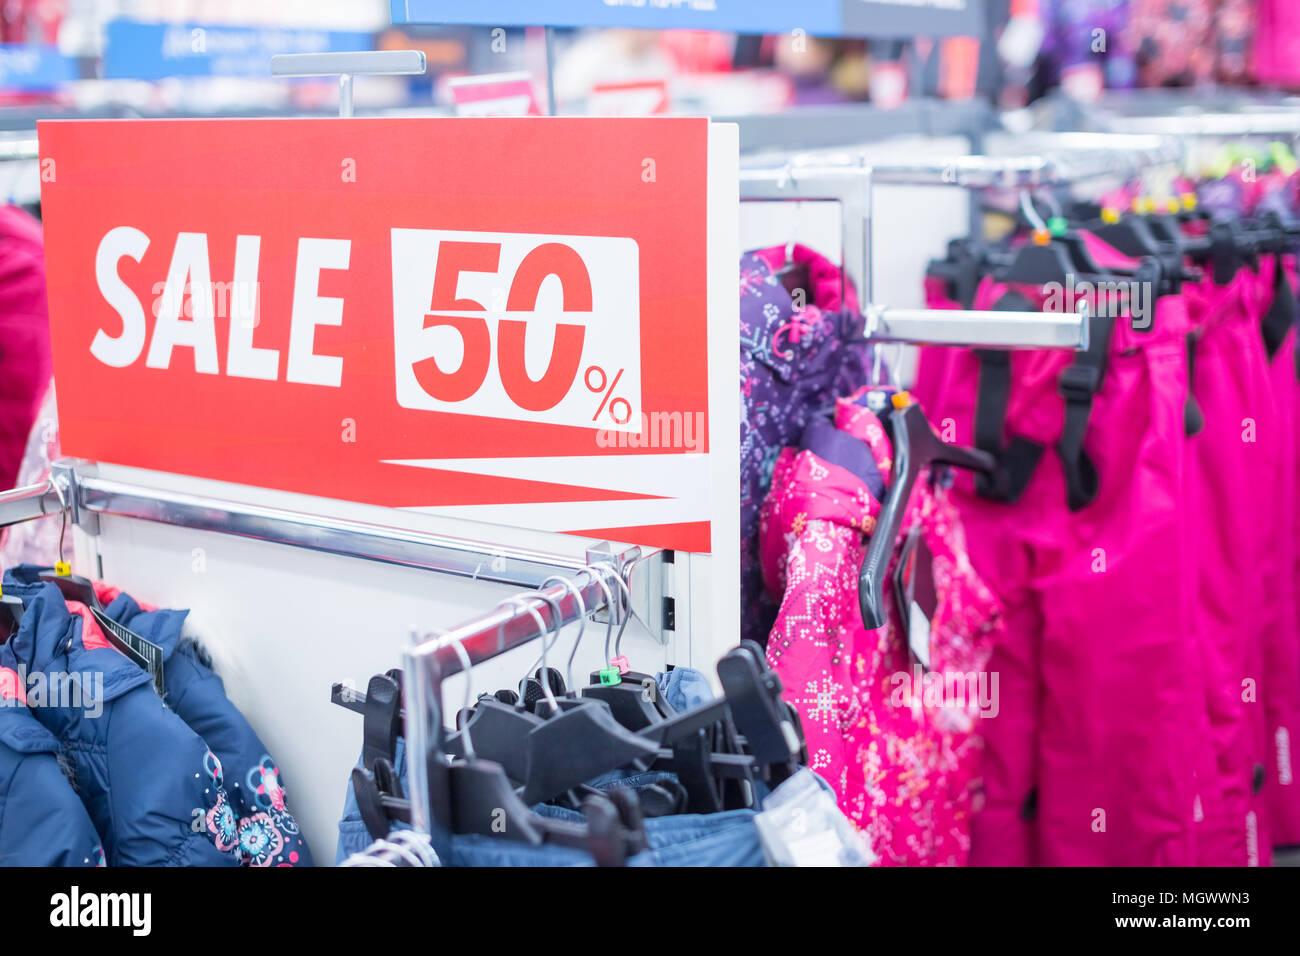 Clearance Sale Sign Imágenes De Stock & Clearance Sale Sign Fotos De ...